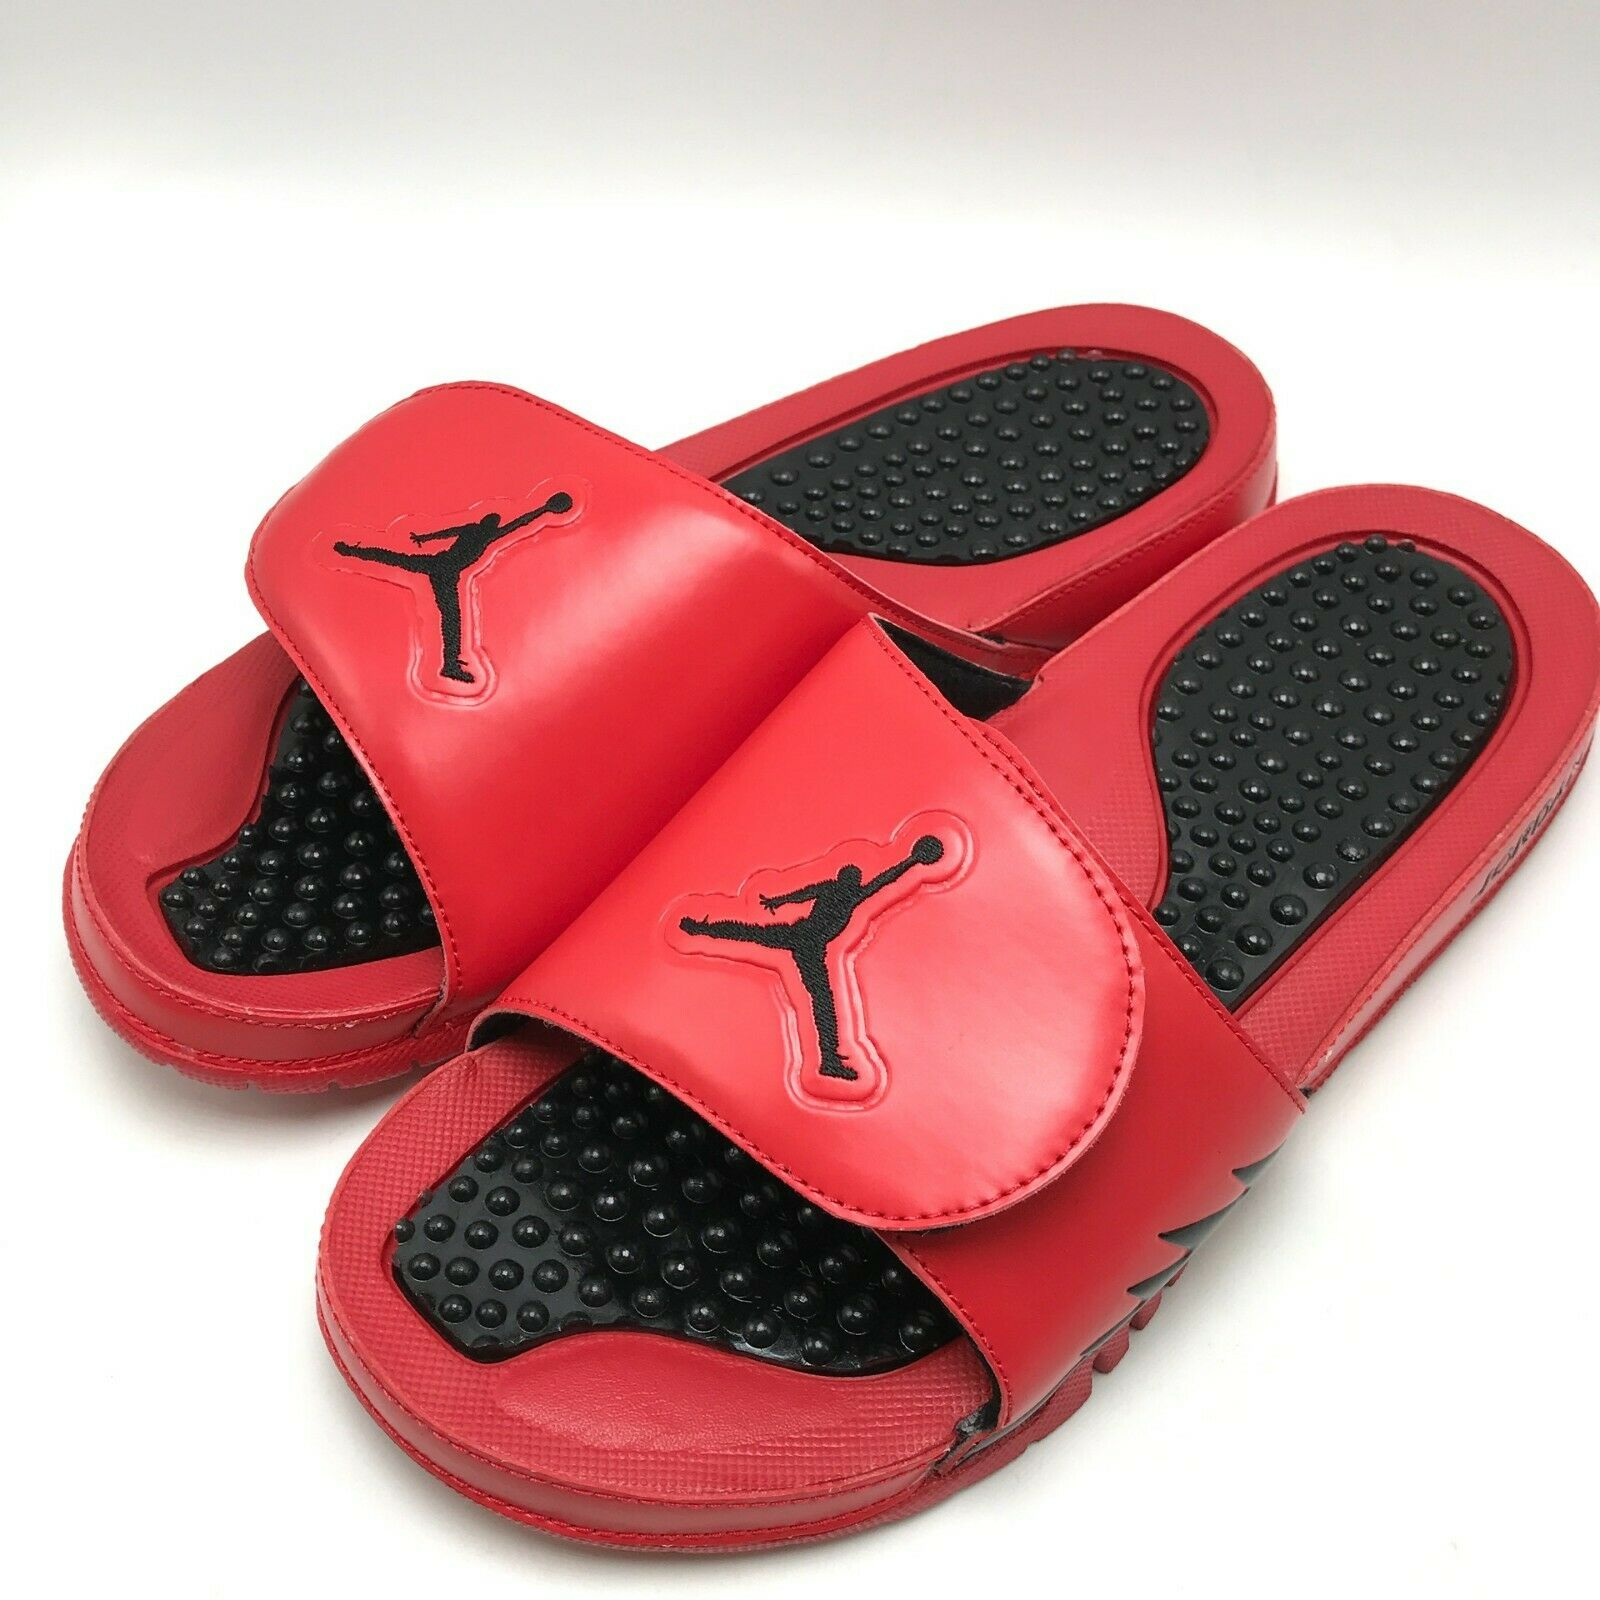 7724764fffd Nike Jordan Hydro V Retro Sandal University University University Red Black- Black 555501-601